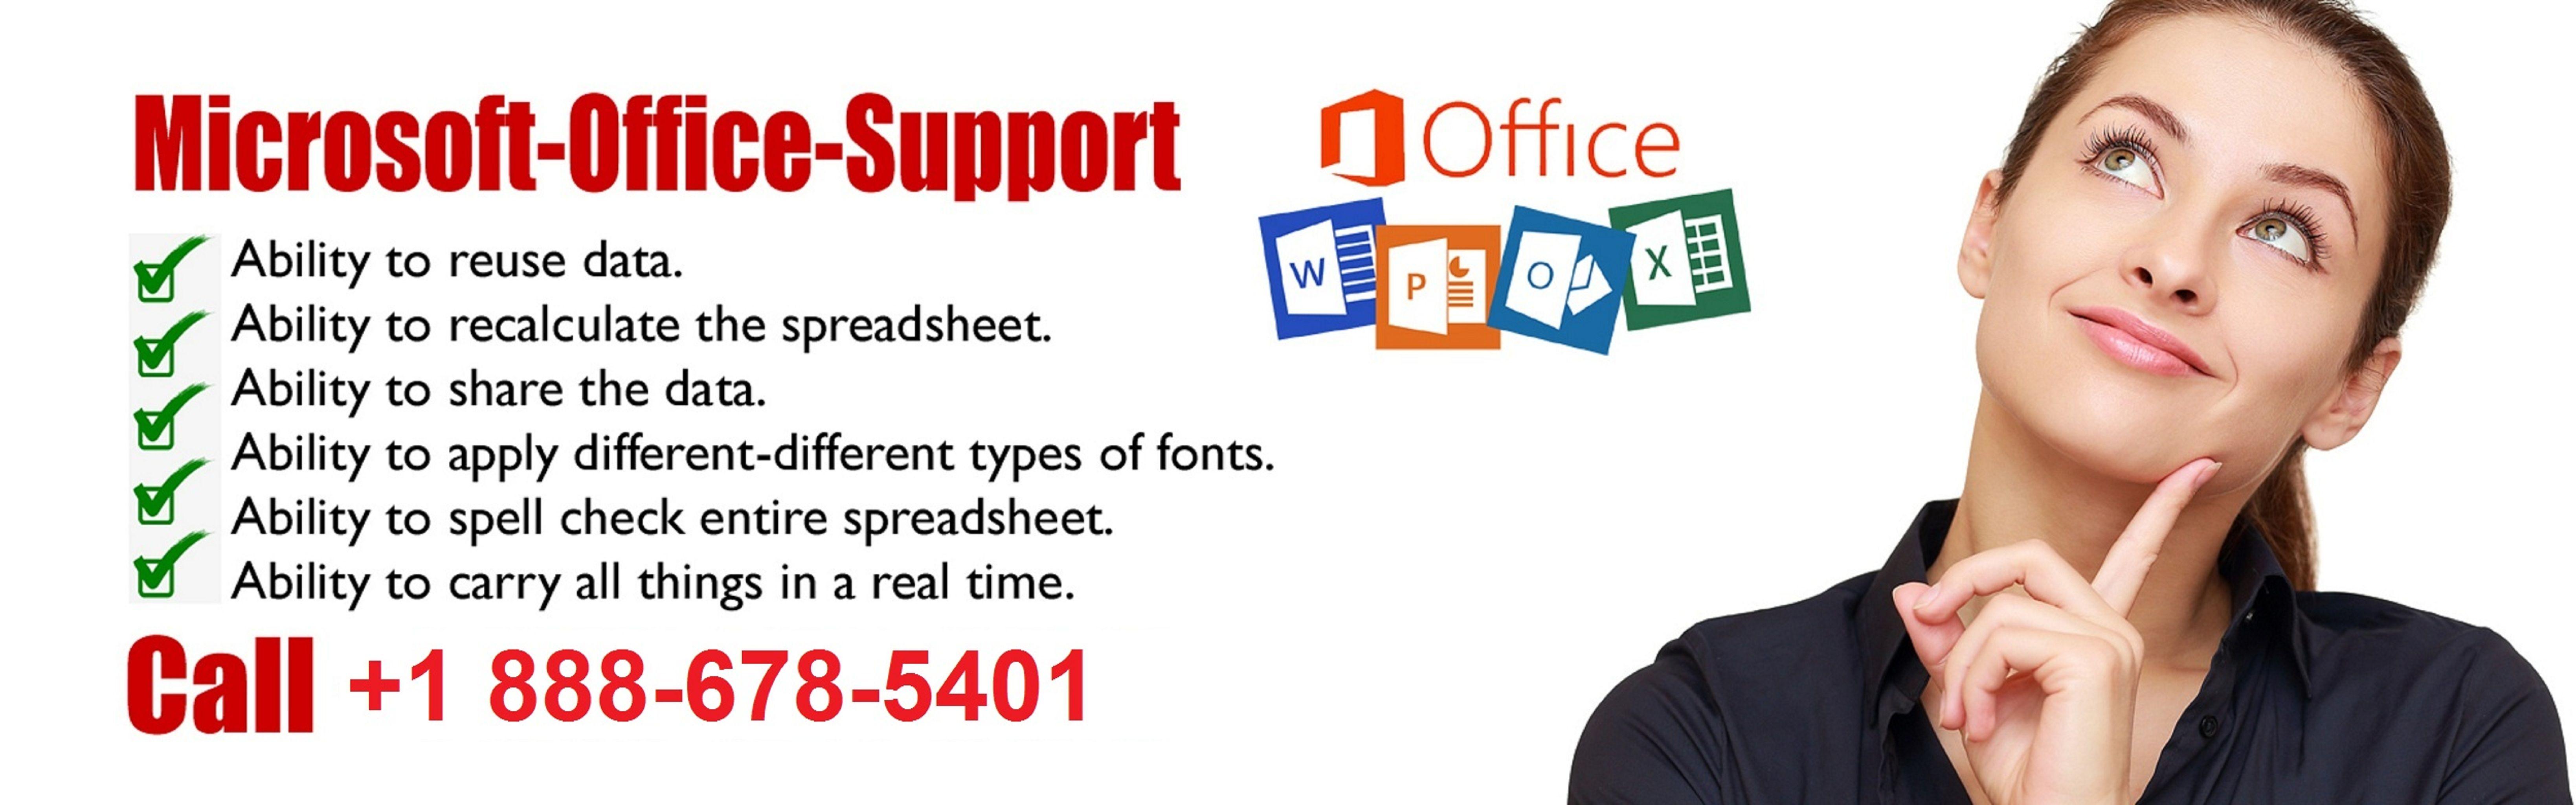 Contact Microsoft Windows 7 customer Support Phone +1888